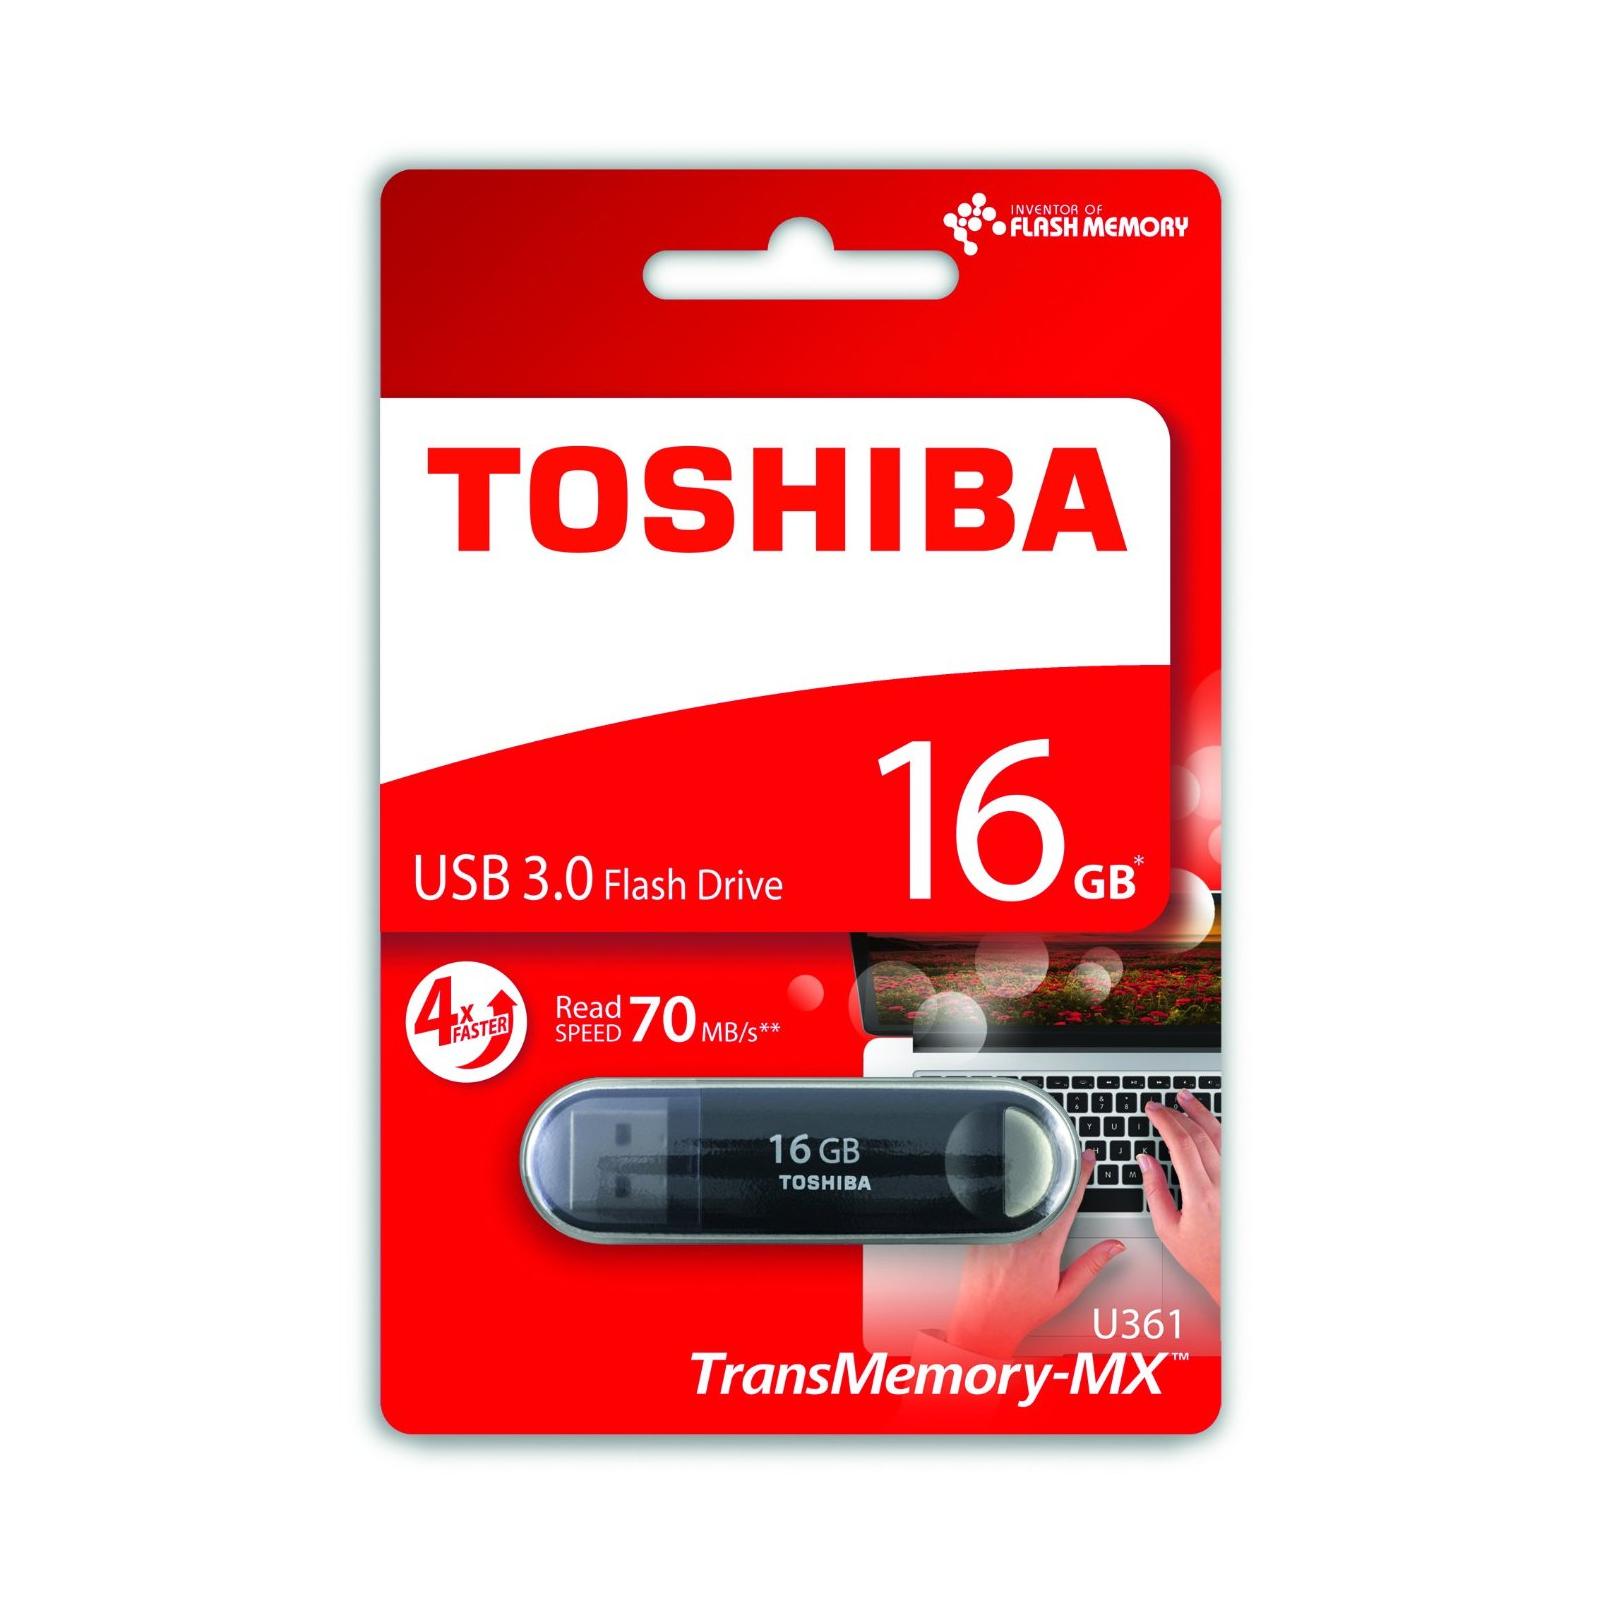 USB флеш накопитель TOSHIBA 16GB Suzaku Black USB 3.0 (THN-U361K0160M4) изображение 3